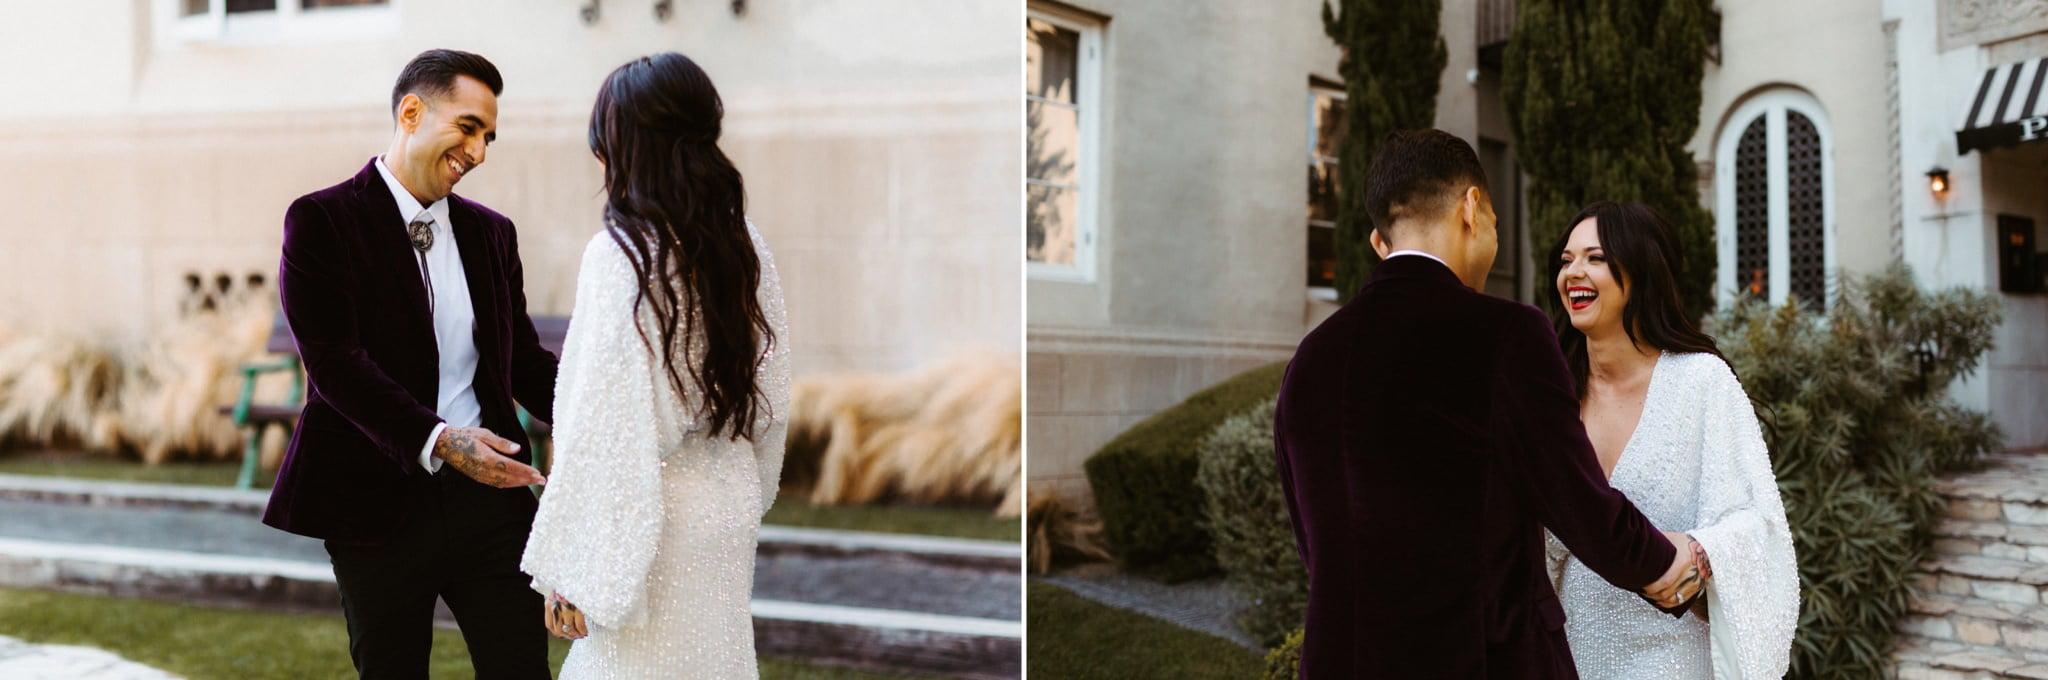 malibu elopement photographer 045